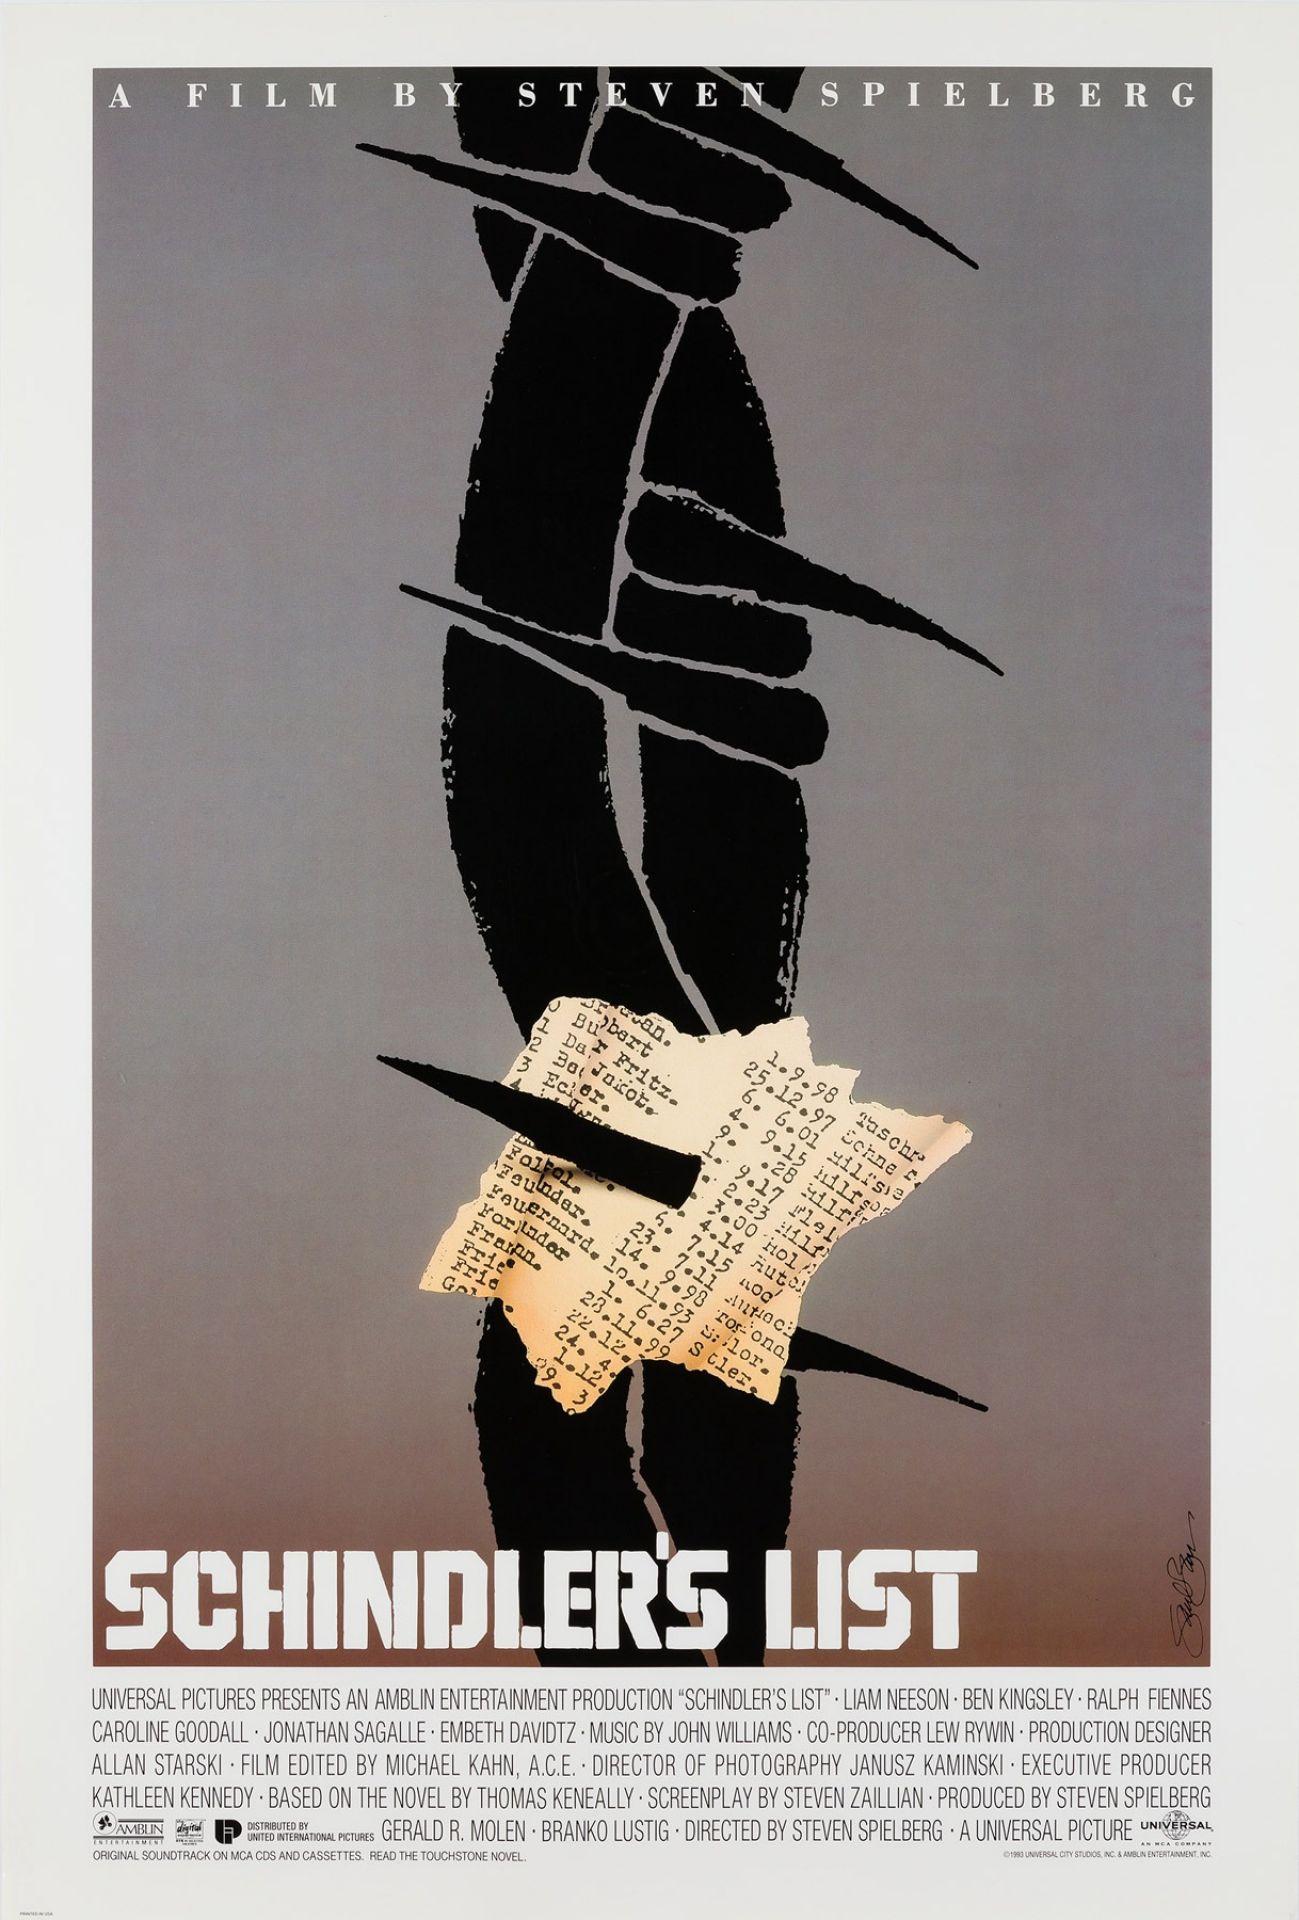 Original Schindler's List 1993 US Special Film Movie Poster, Saul Bass